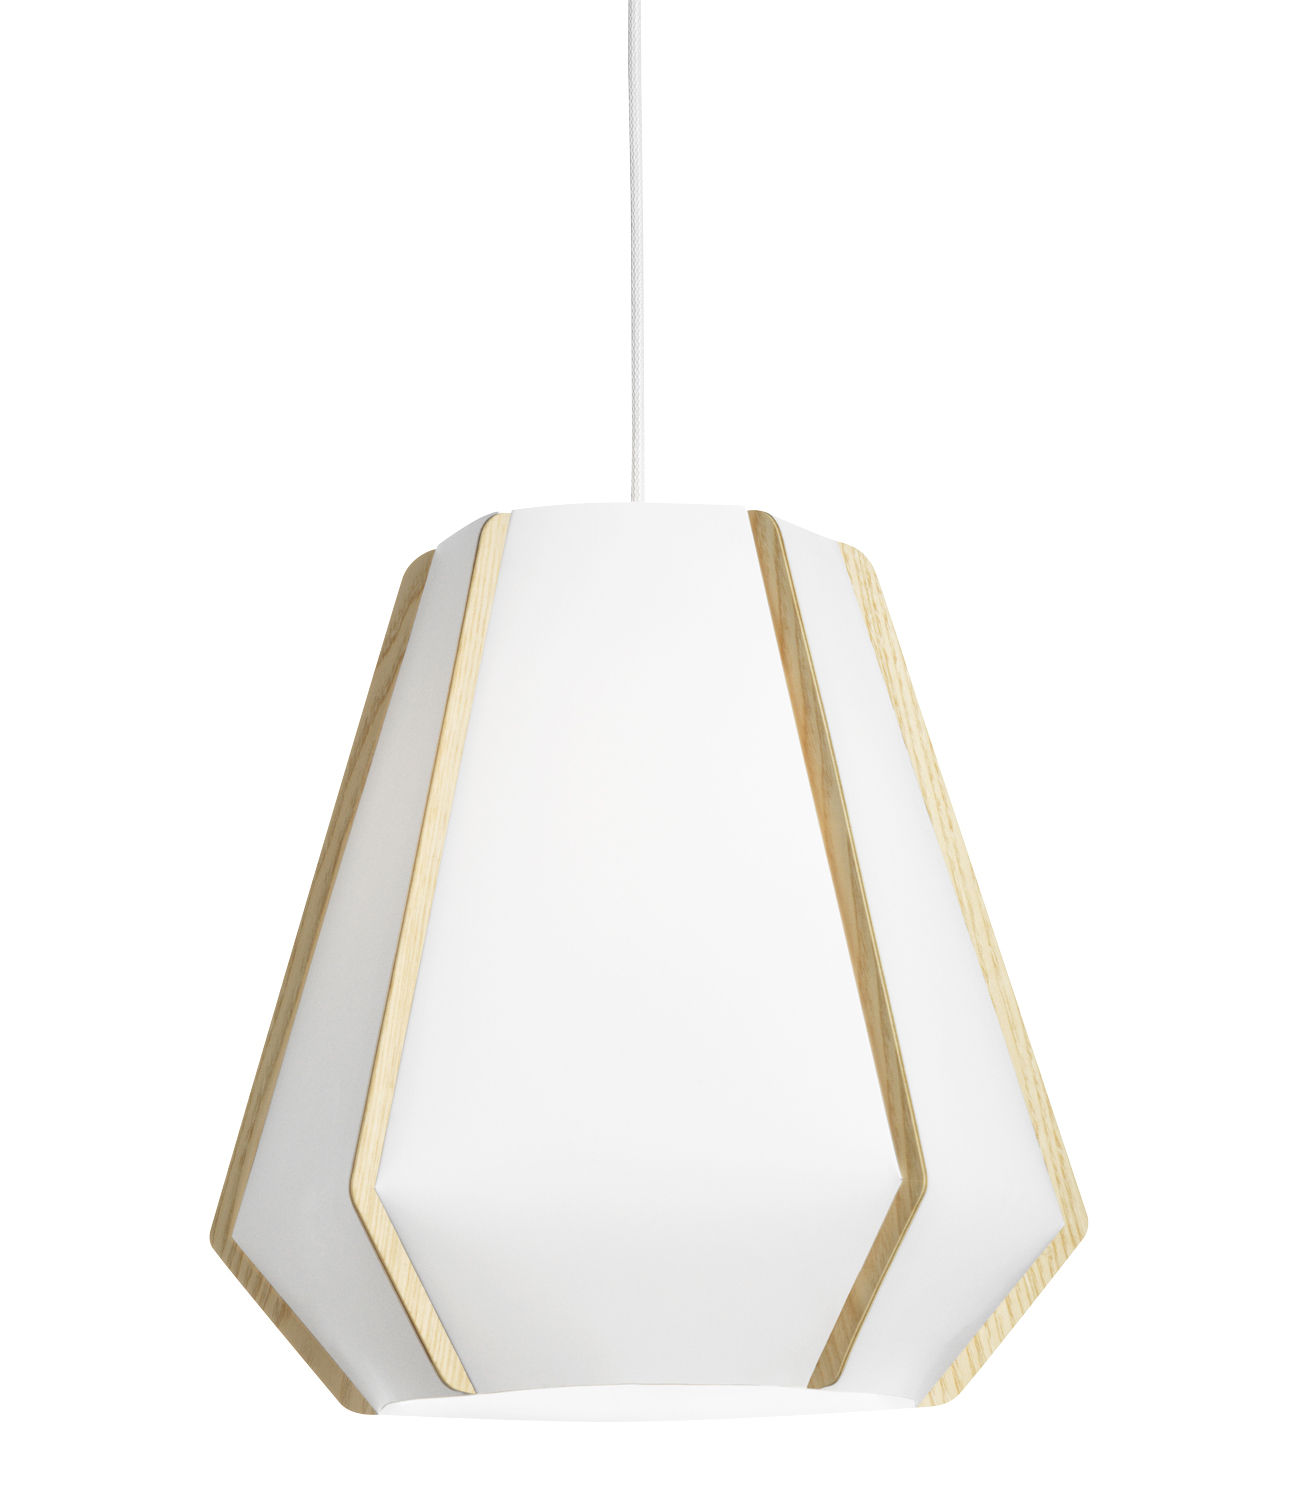 Luminaire - Suspensions - Suspension Lullaby P2 / Ø 43 x H 39 cm - Lightyears - Blanc / Frêne - Frêne, Papier de pierre